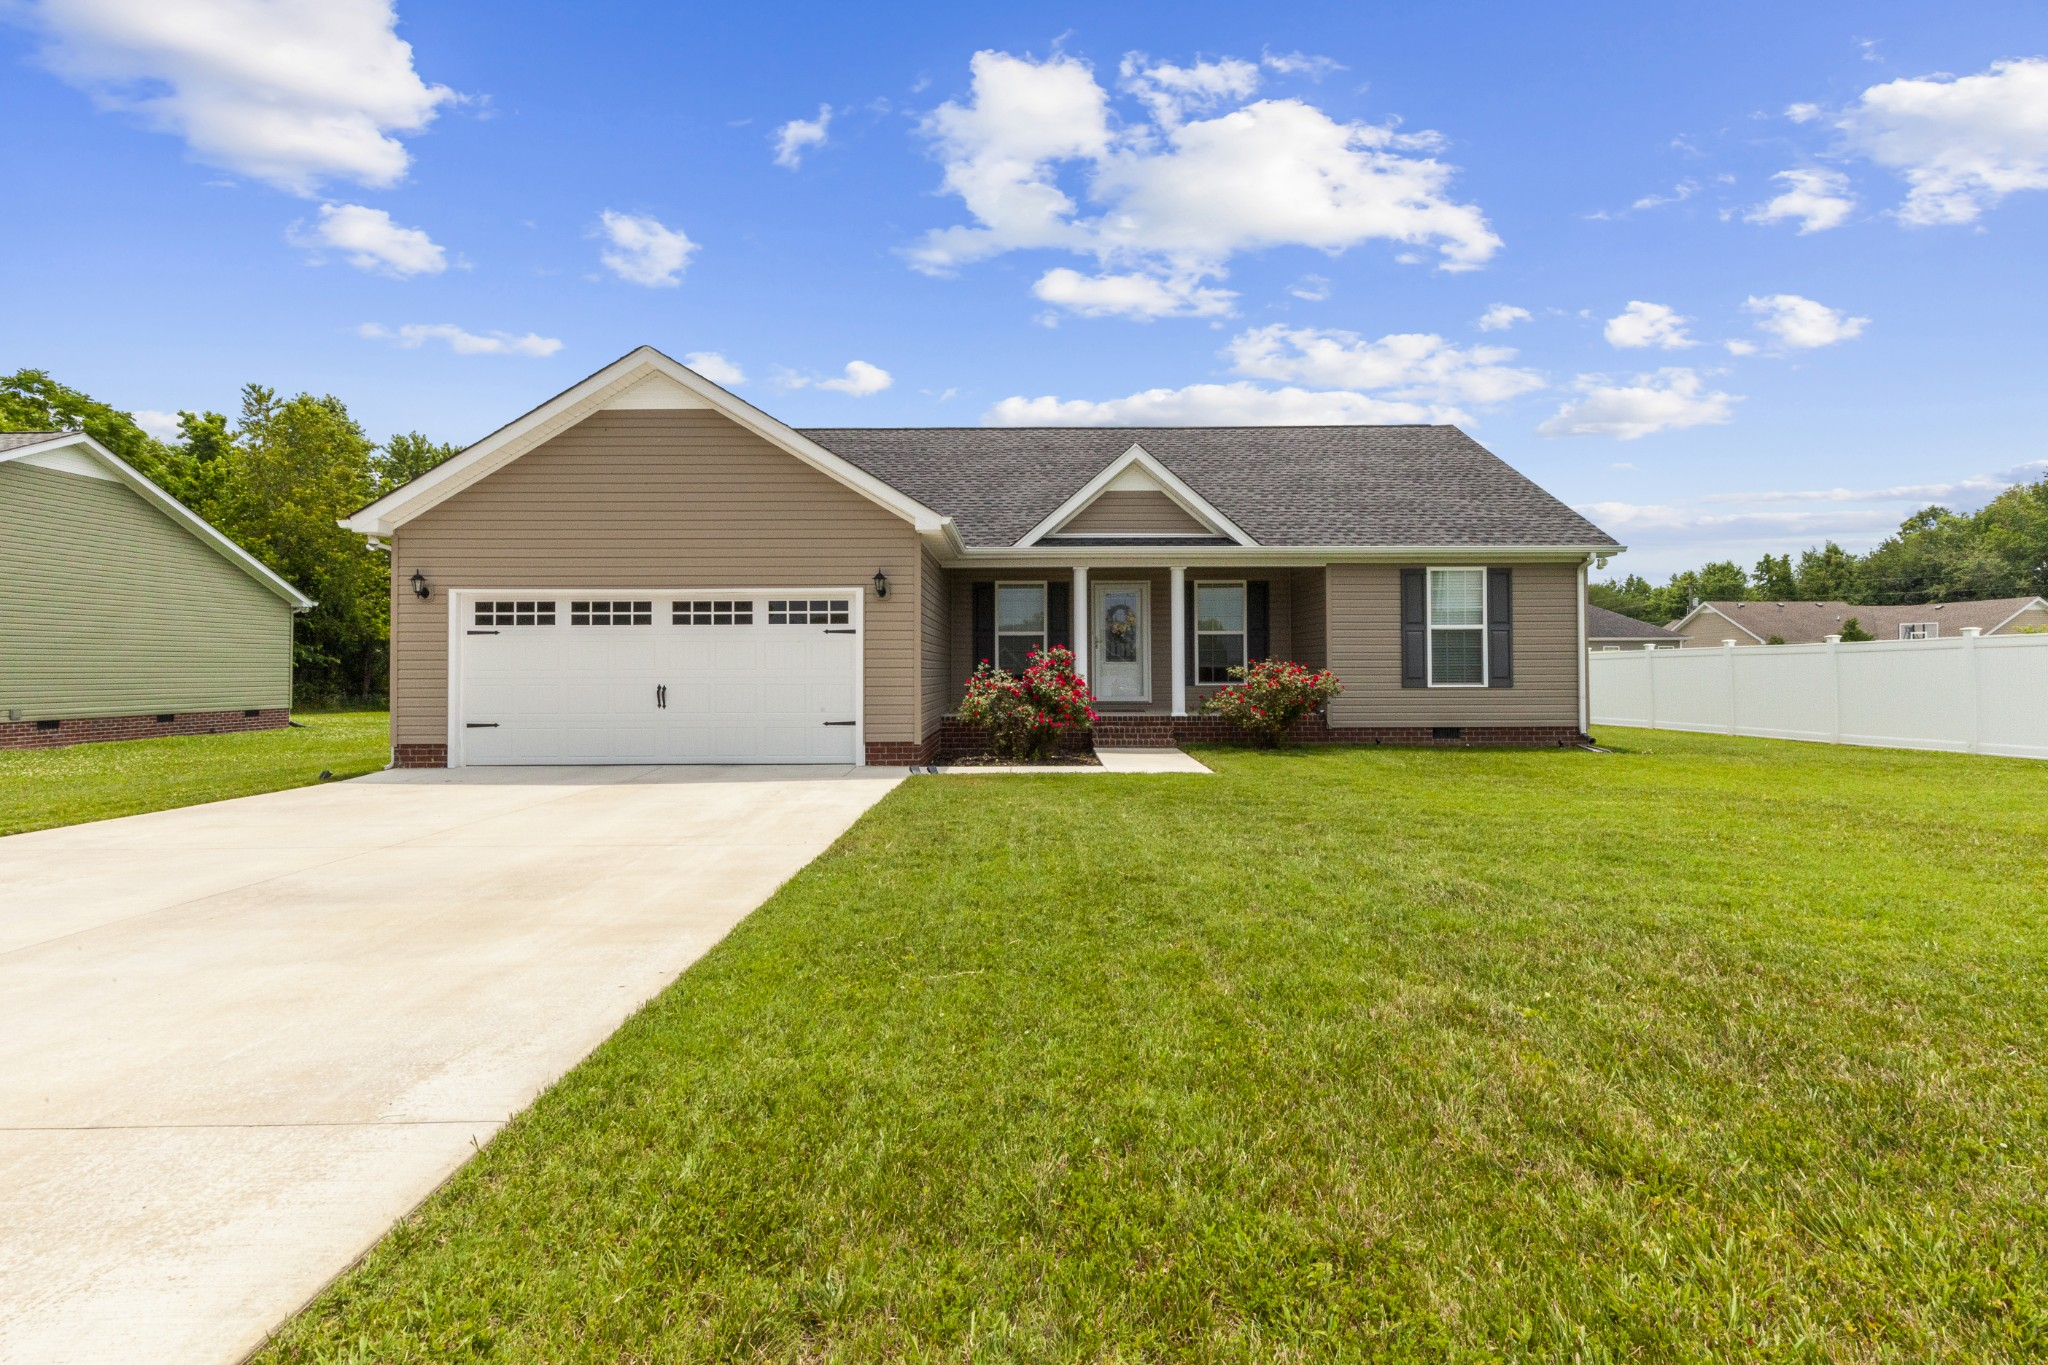 147 Autumn Evening St Property Photo - Smithville, TN real estate listing